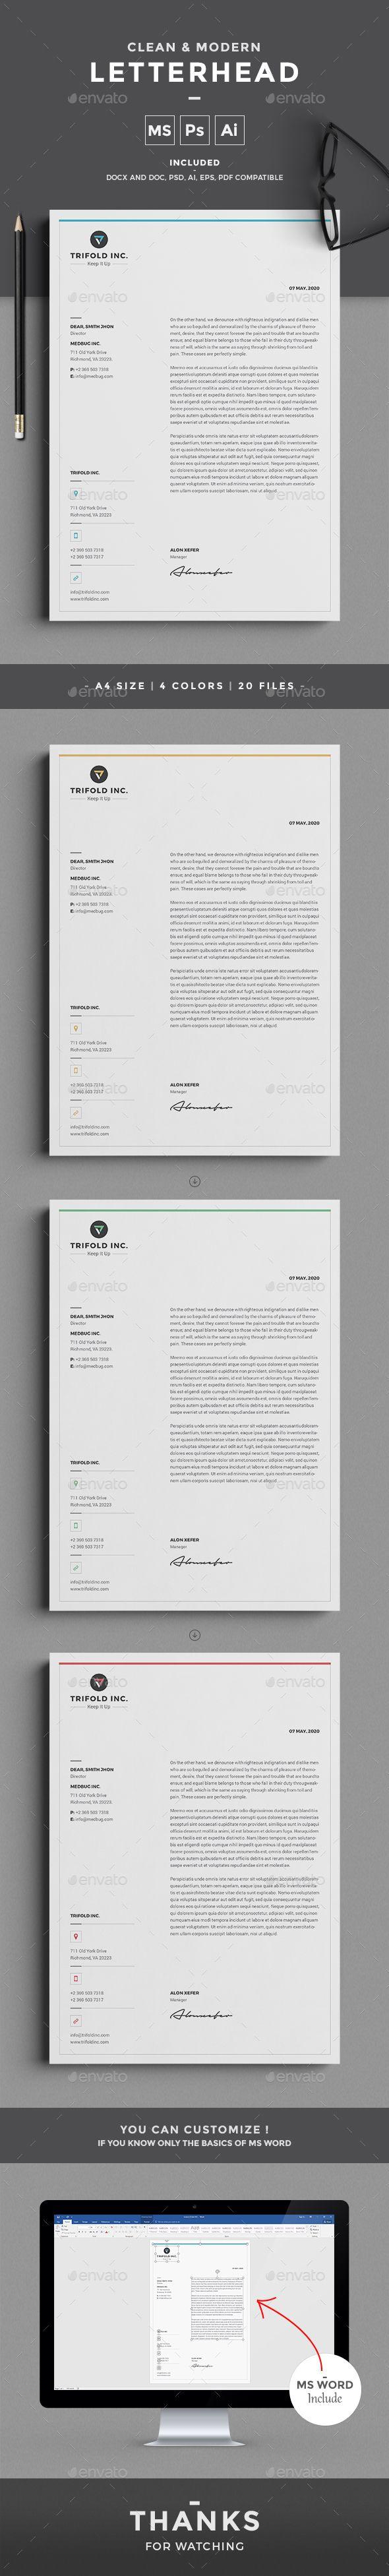 letterhead stationery templates